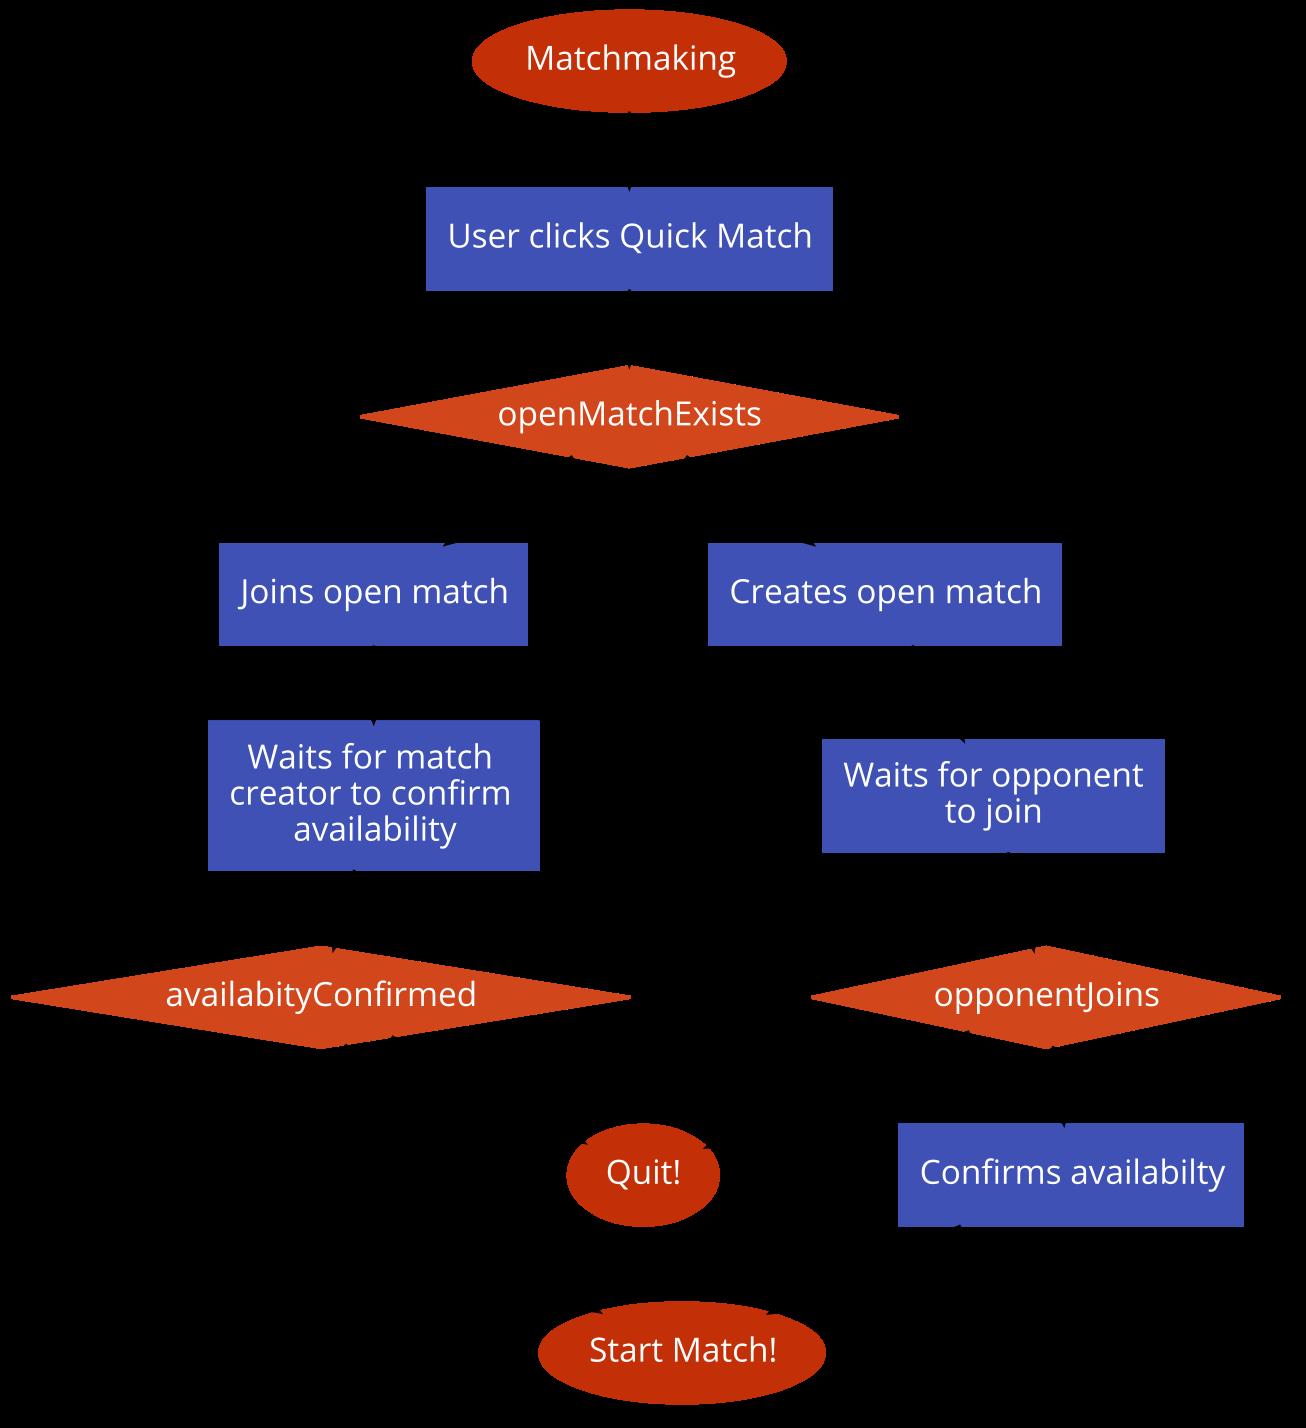 Matchmaking flow